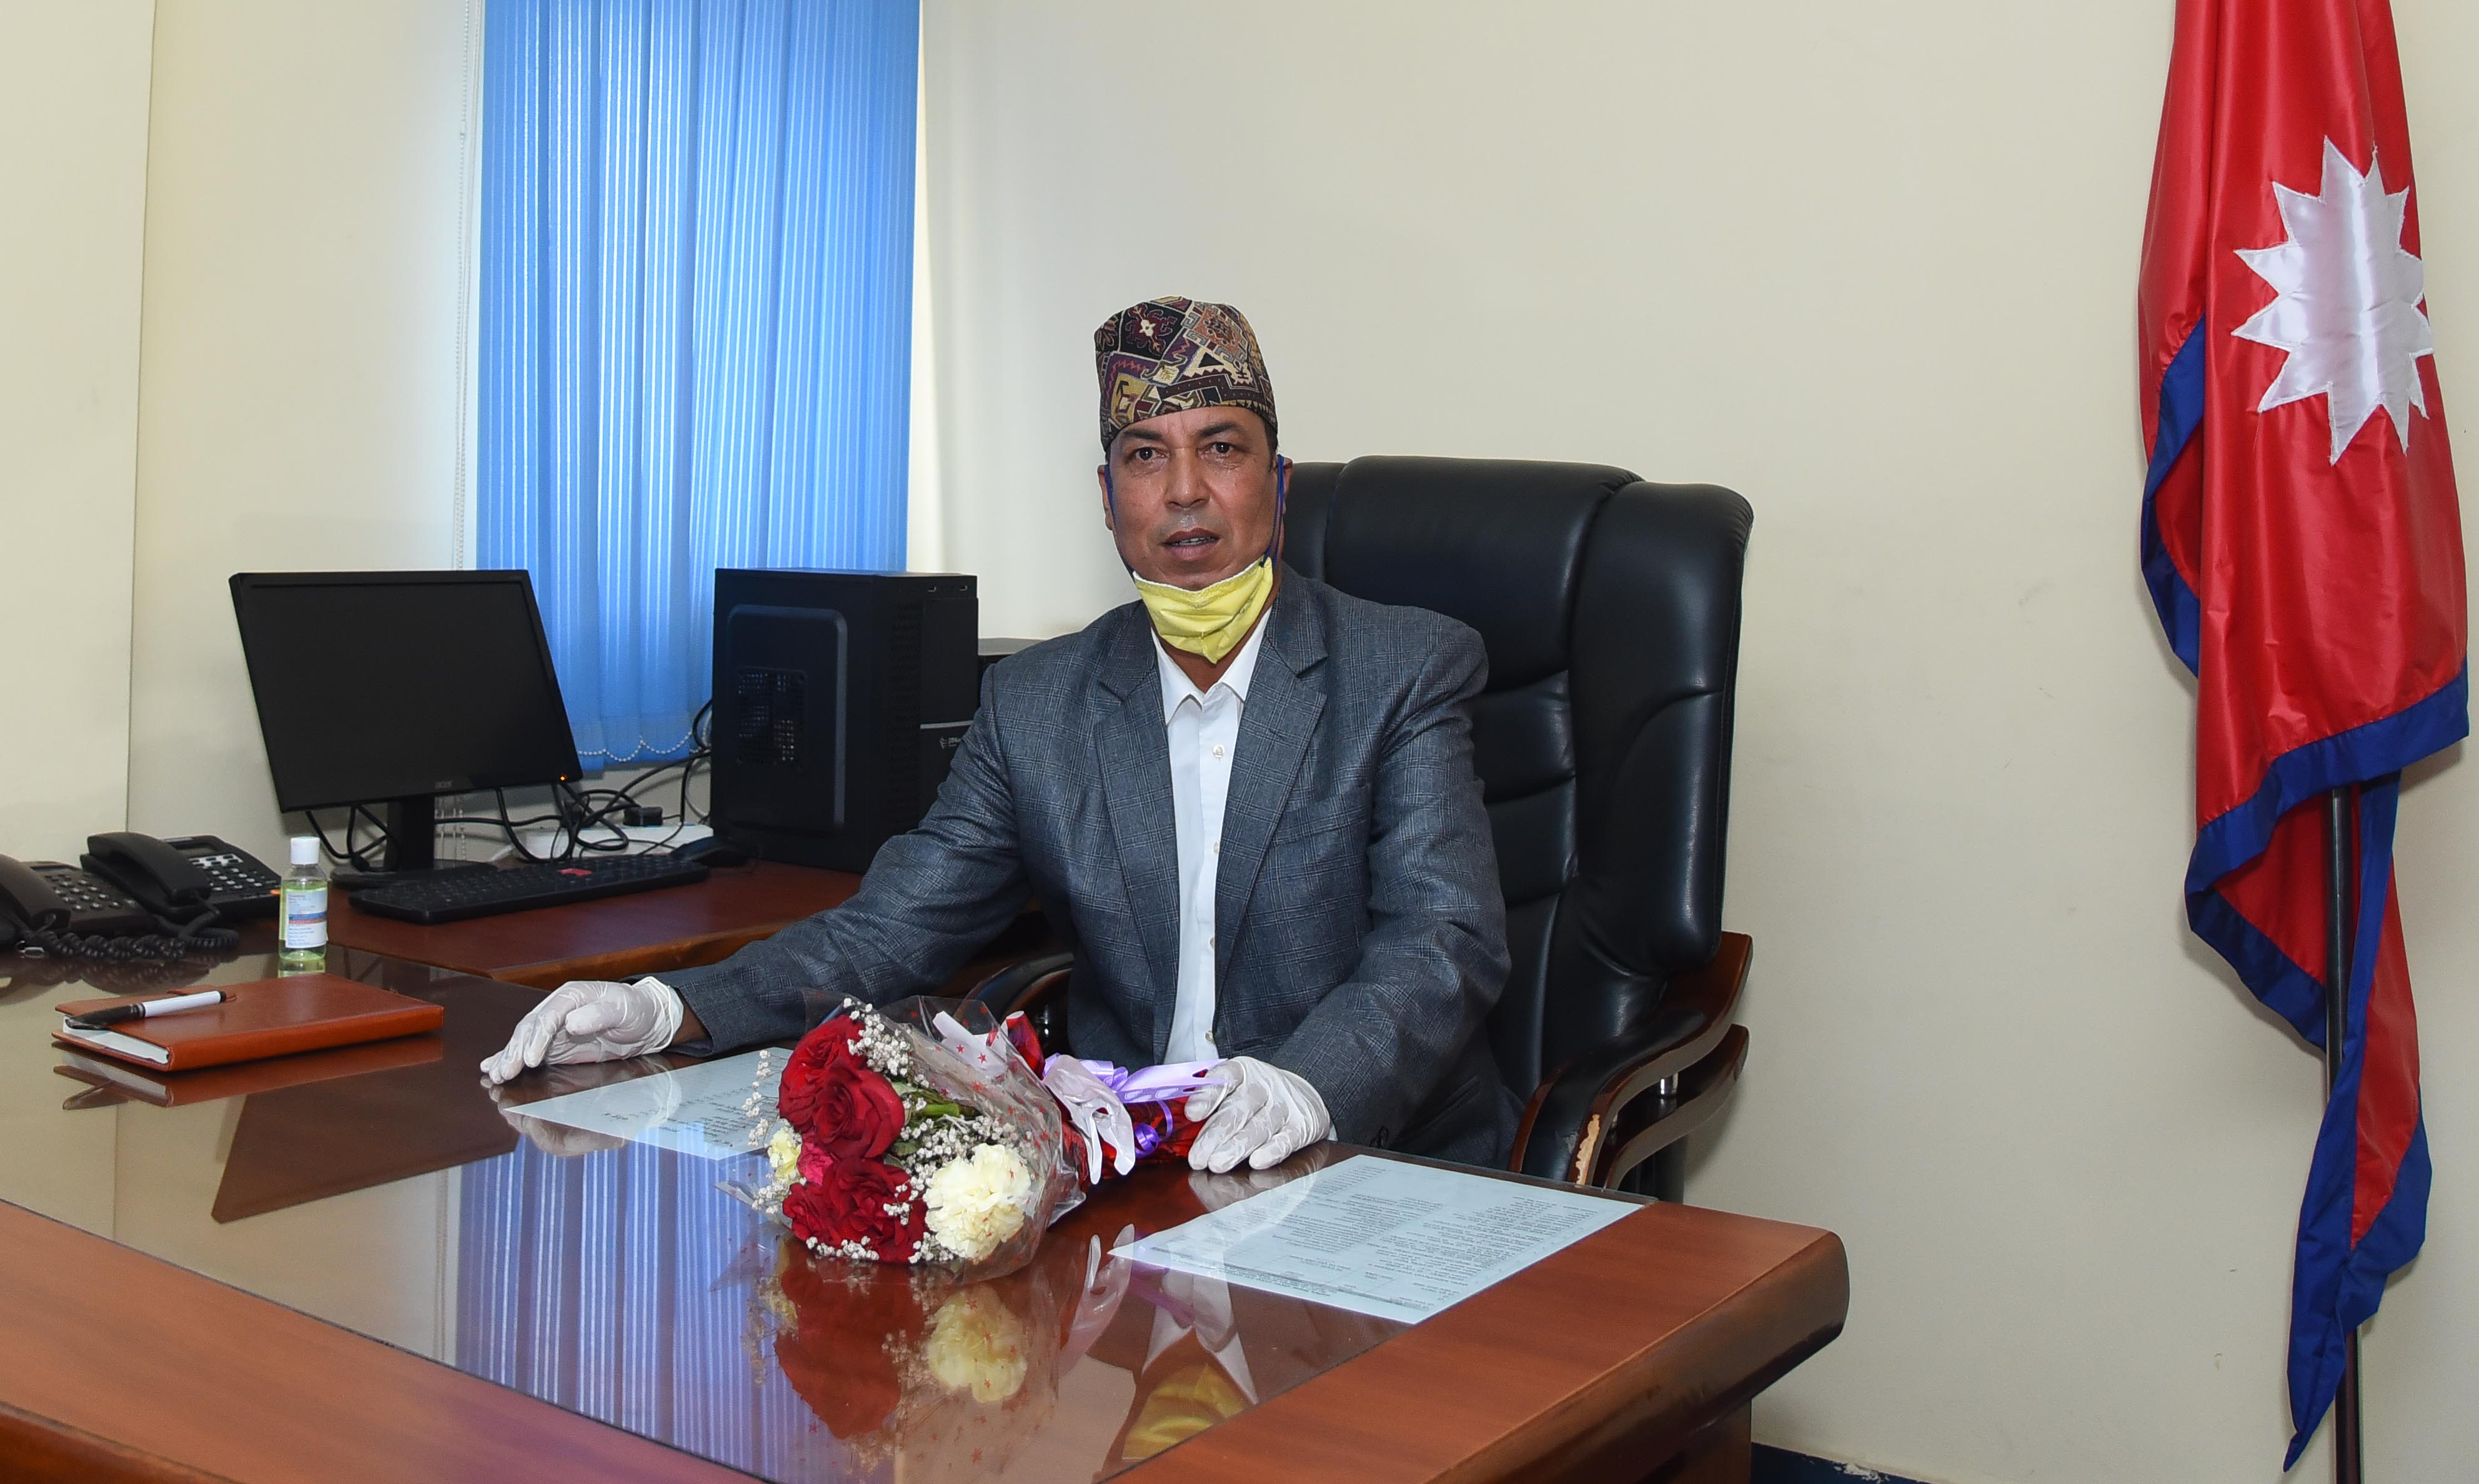 Chairperson Dayaram Dahal of Film Development Board Nepal. Photo Courtesy: Film Development Board Nepal